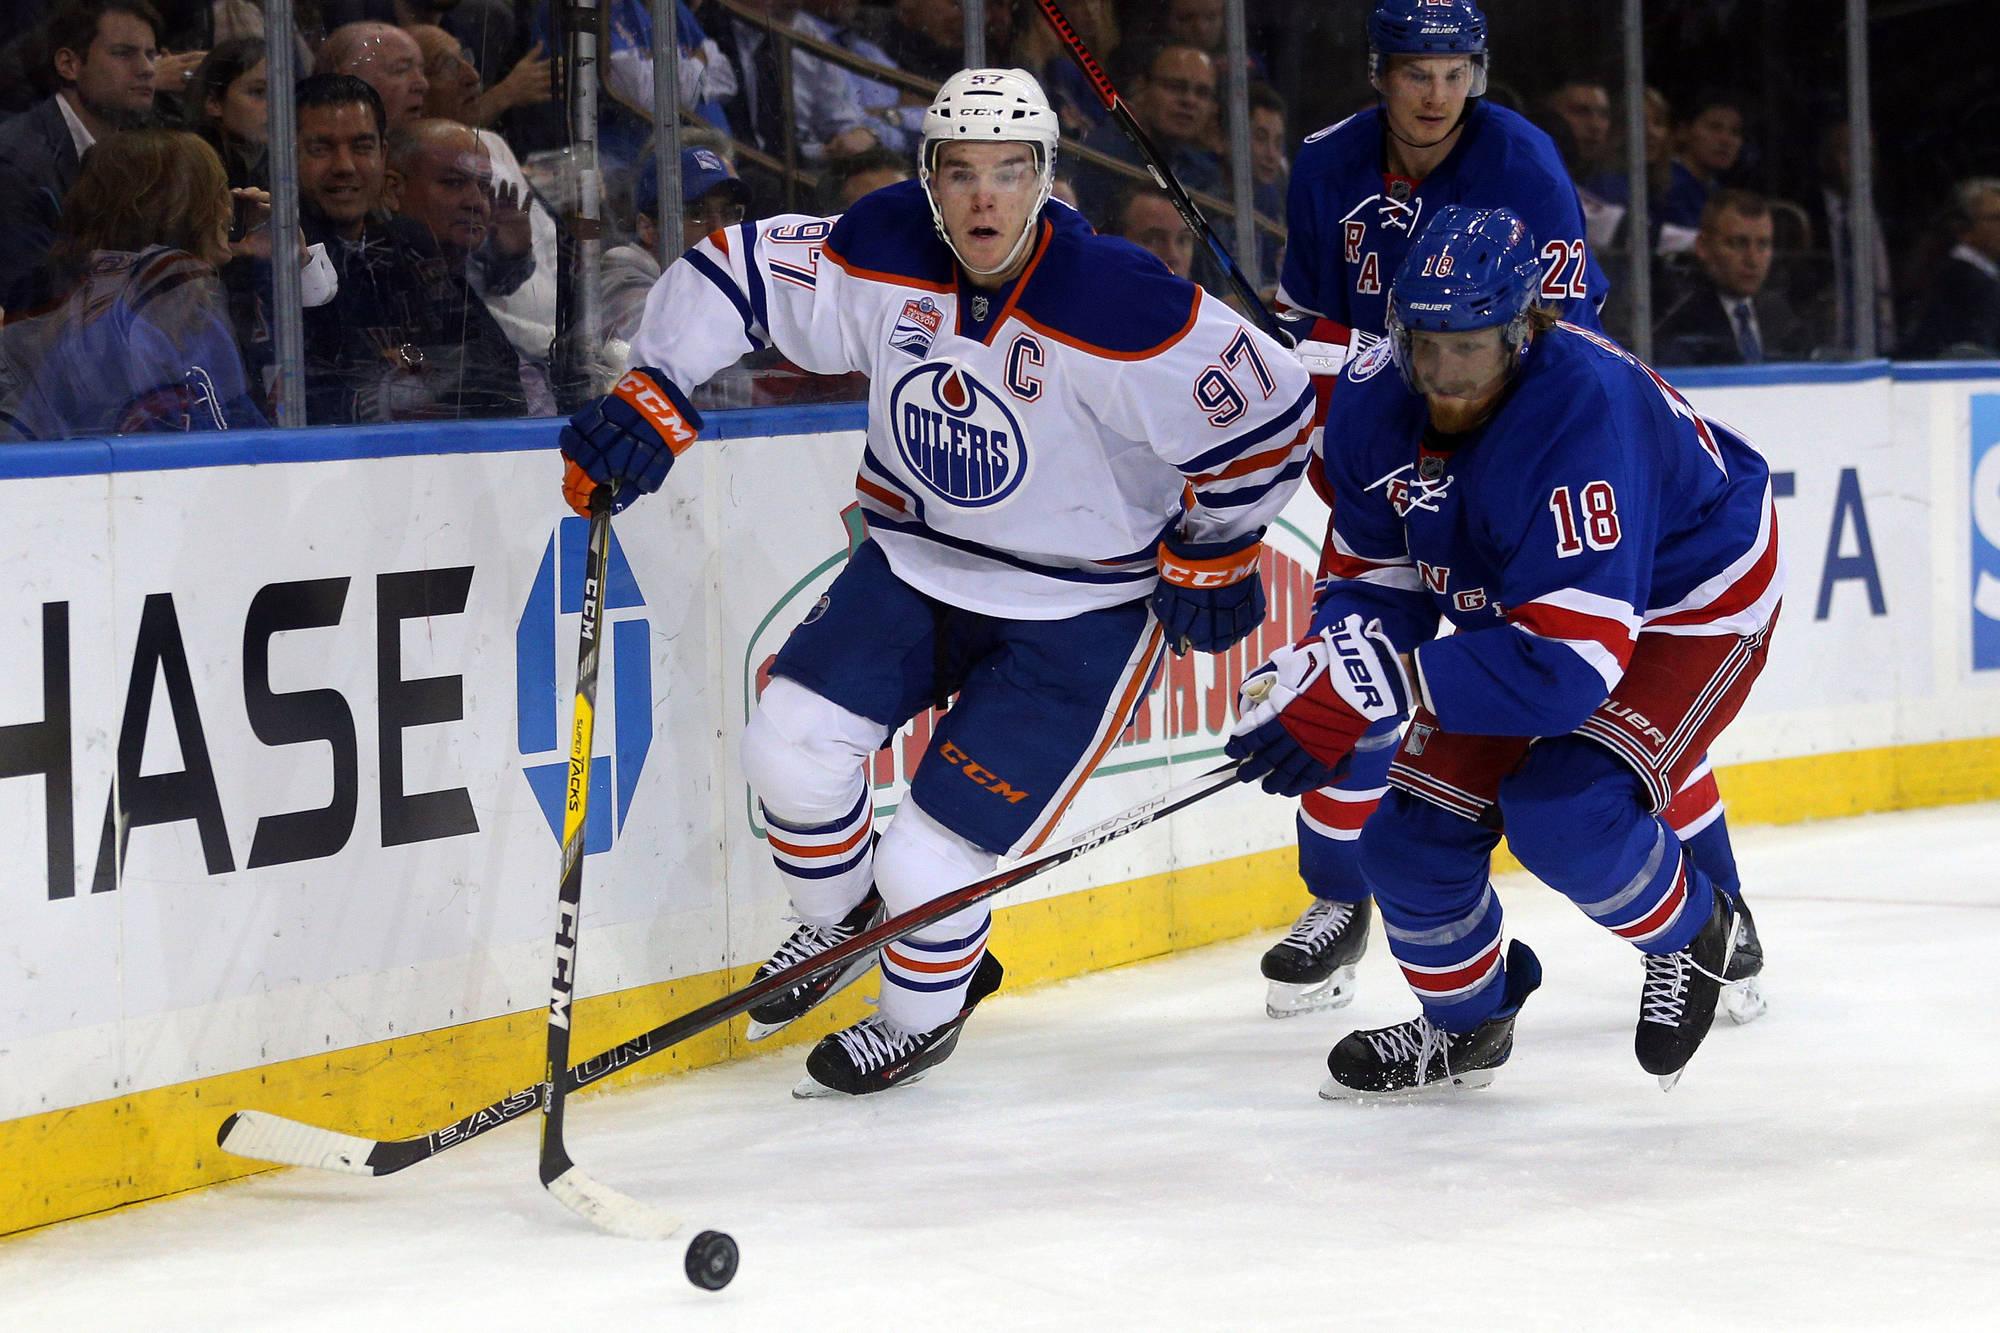 NHL- Edmonton Oilers @ NY Islanders (Pregame)